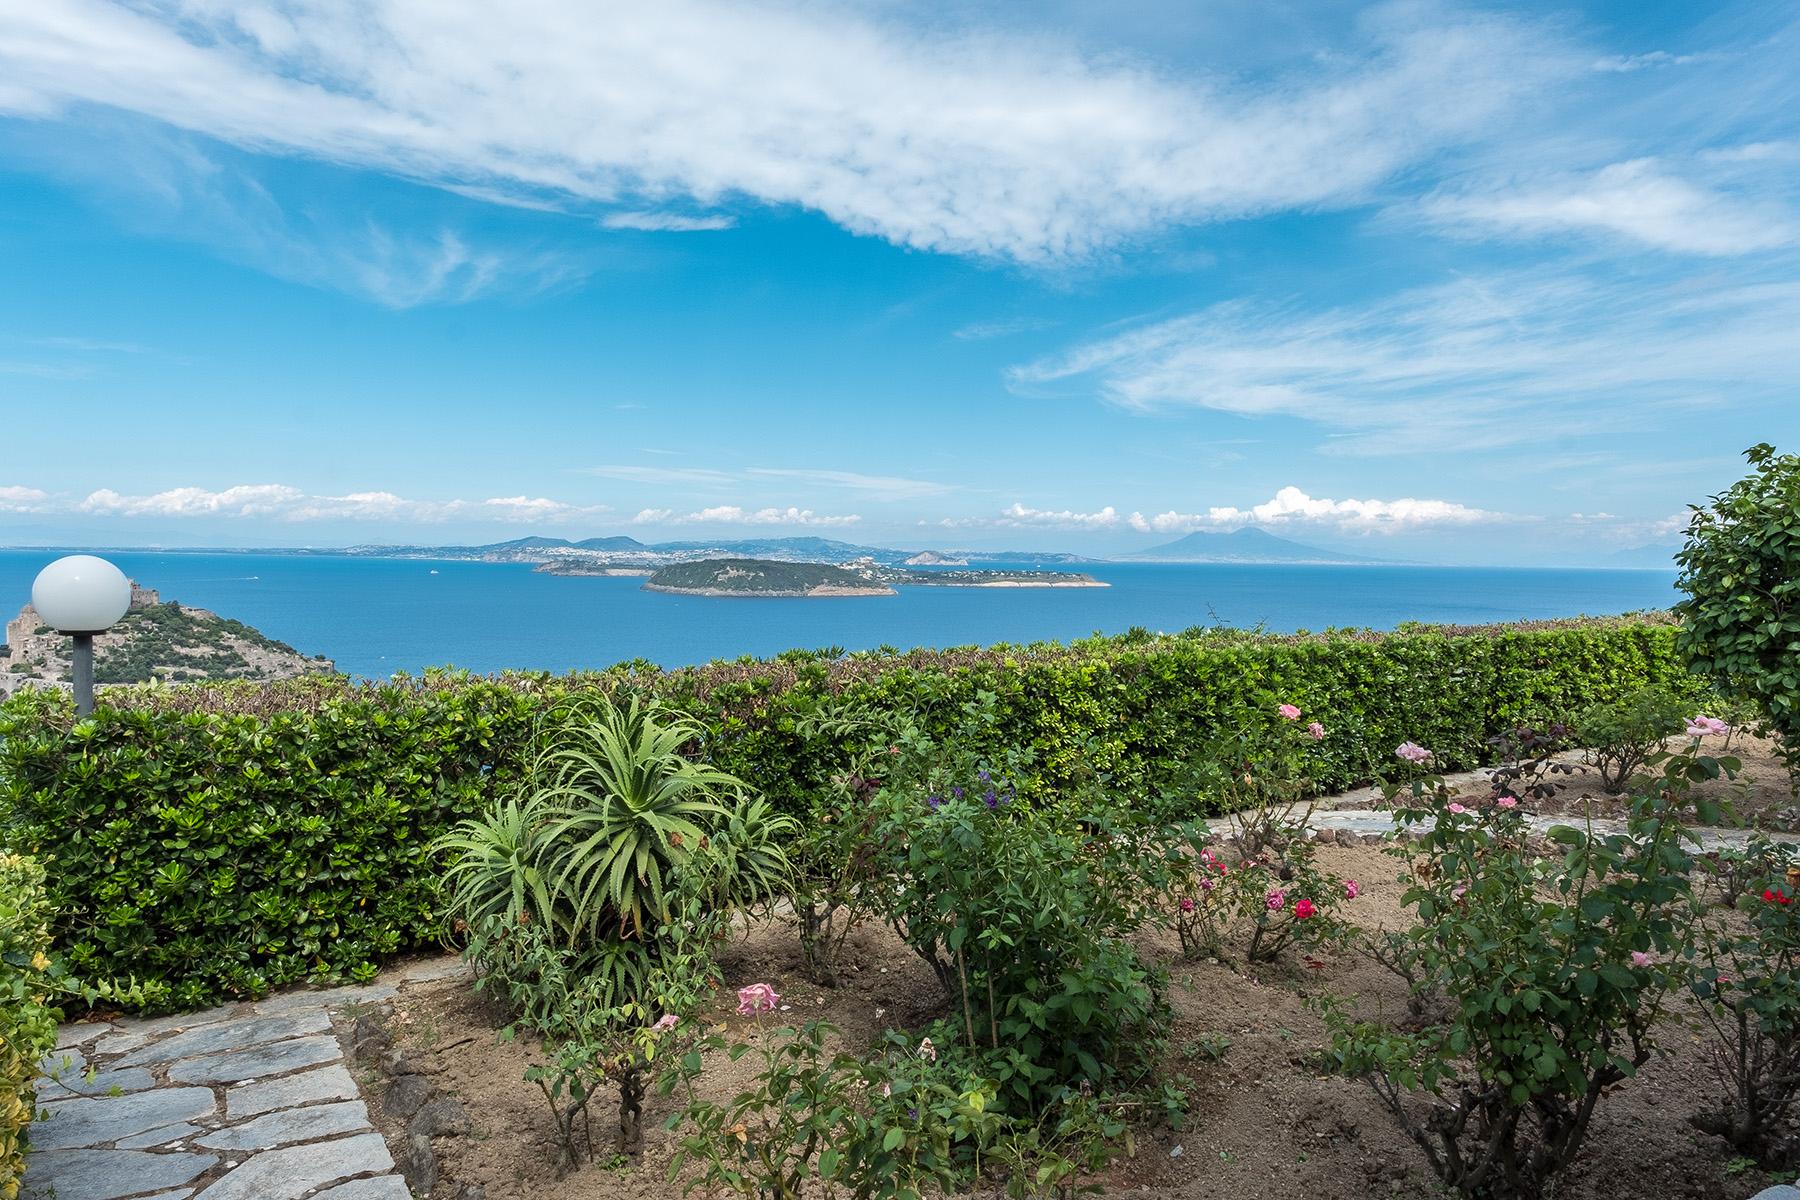 Villa in Vendita a Ischia: 5 locali, 500 mq - Foto 14